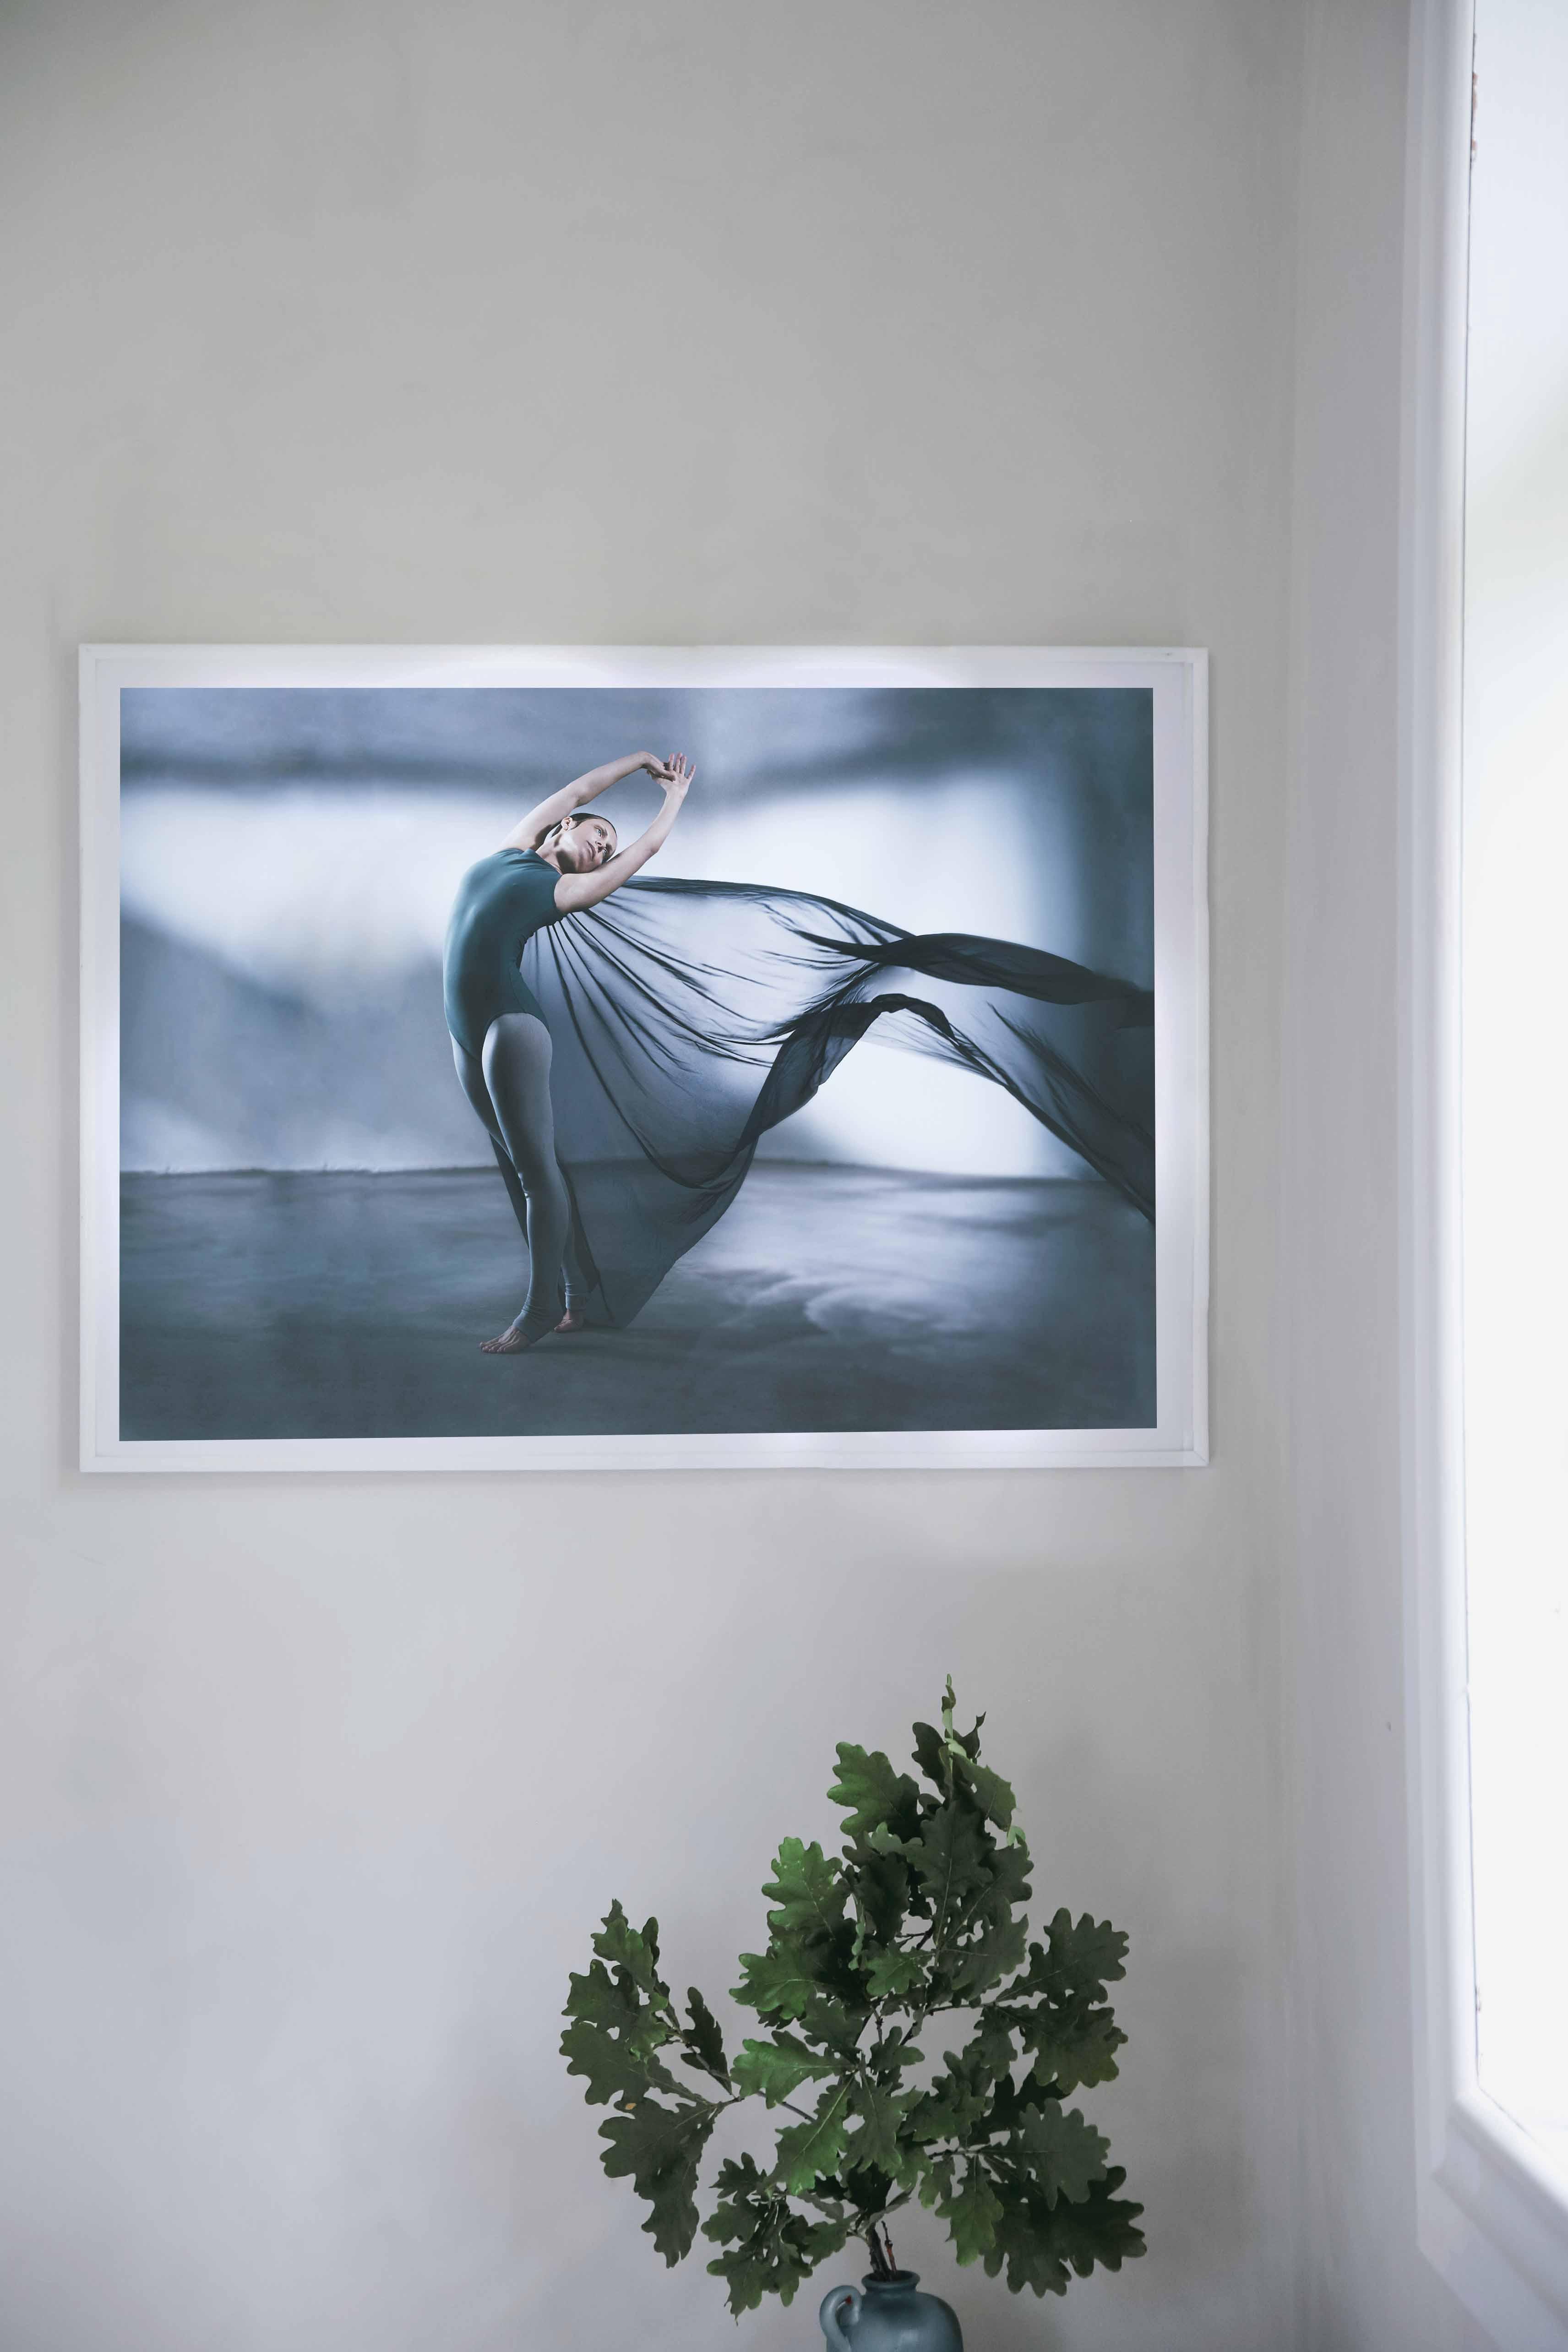 A woman with a flowy dress that dances